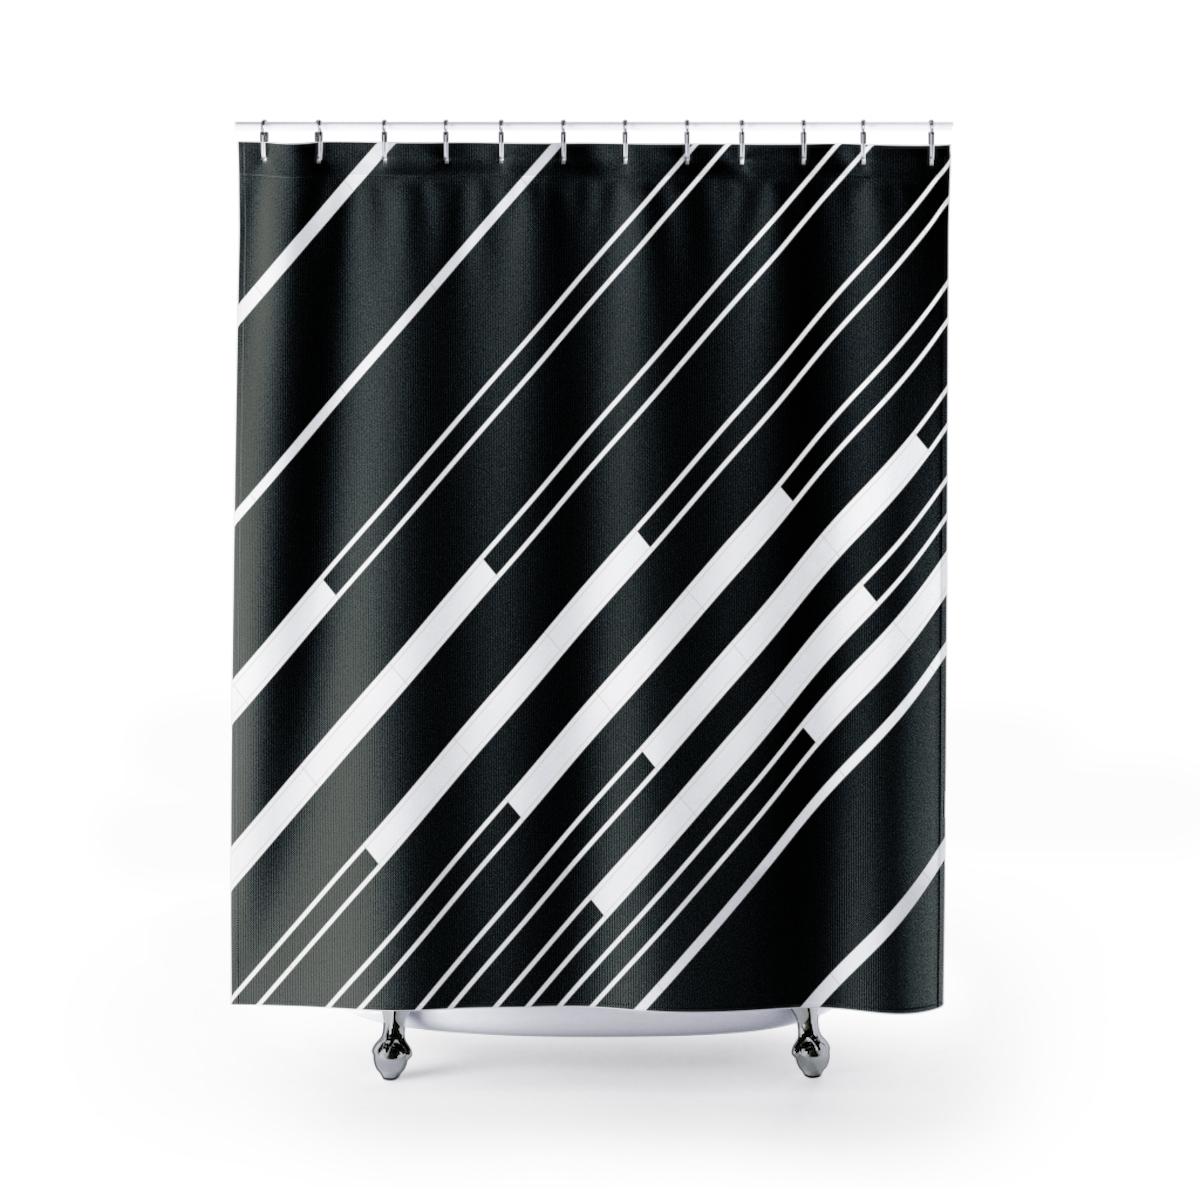 Ivory Keys: black shower curtain with diagonal stripes